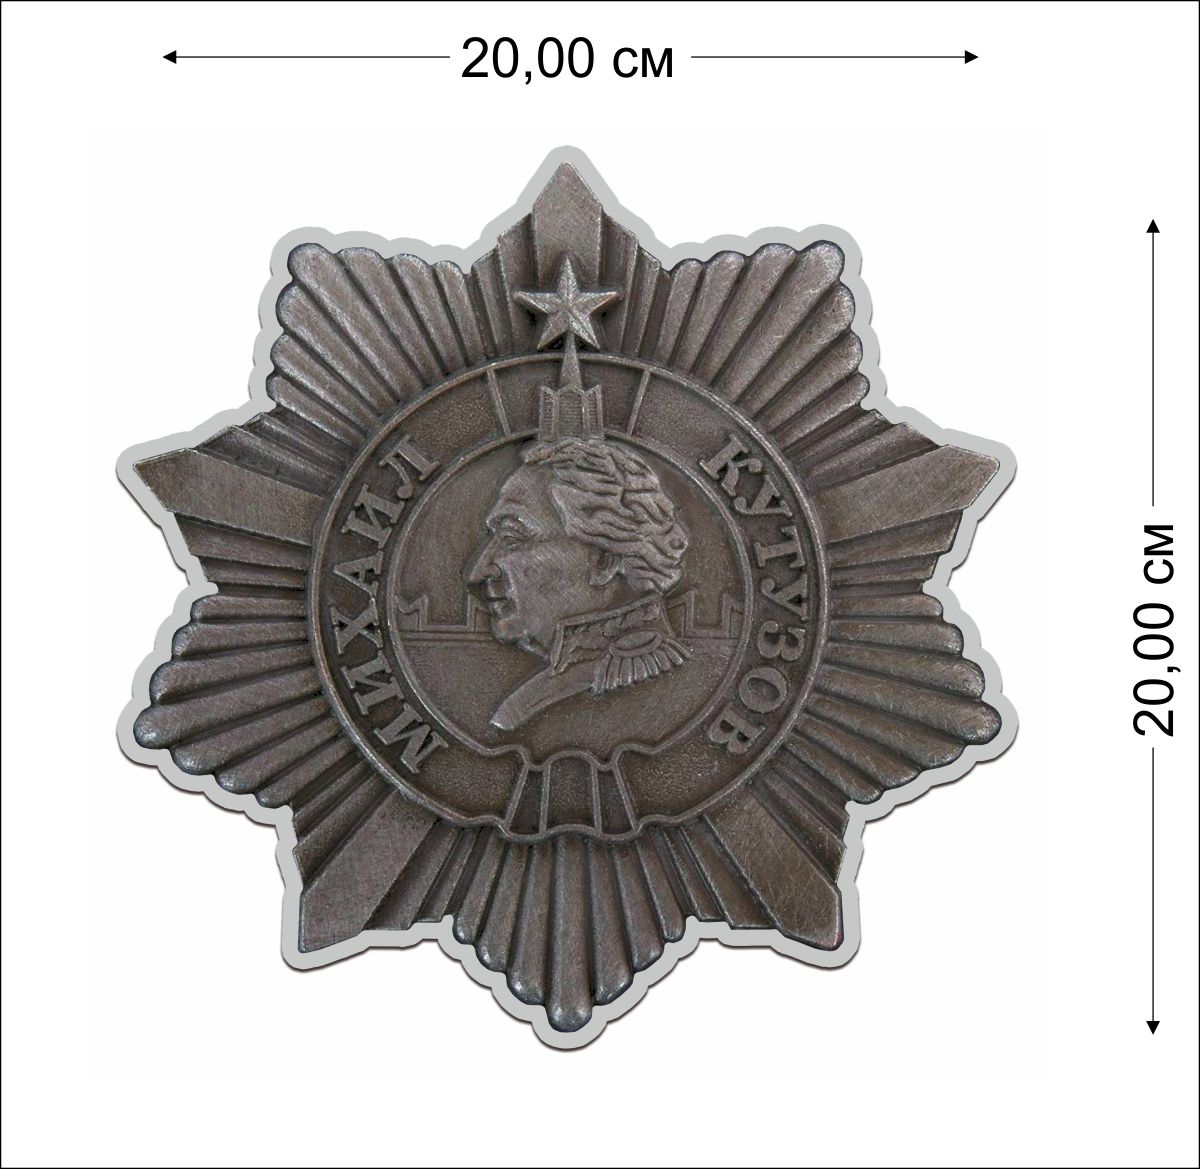 Наклейка с орденом Кутузова 3 степени